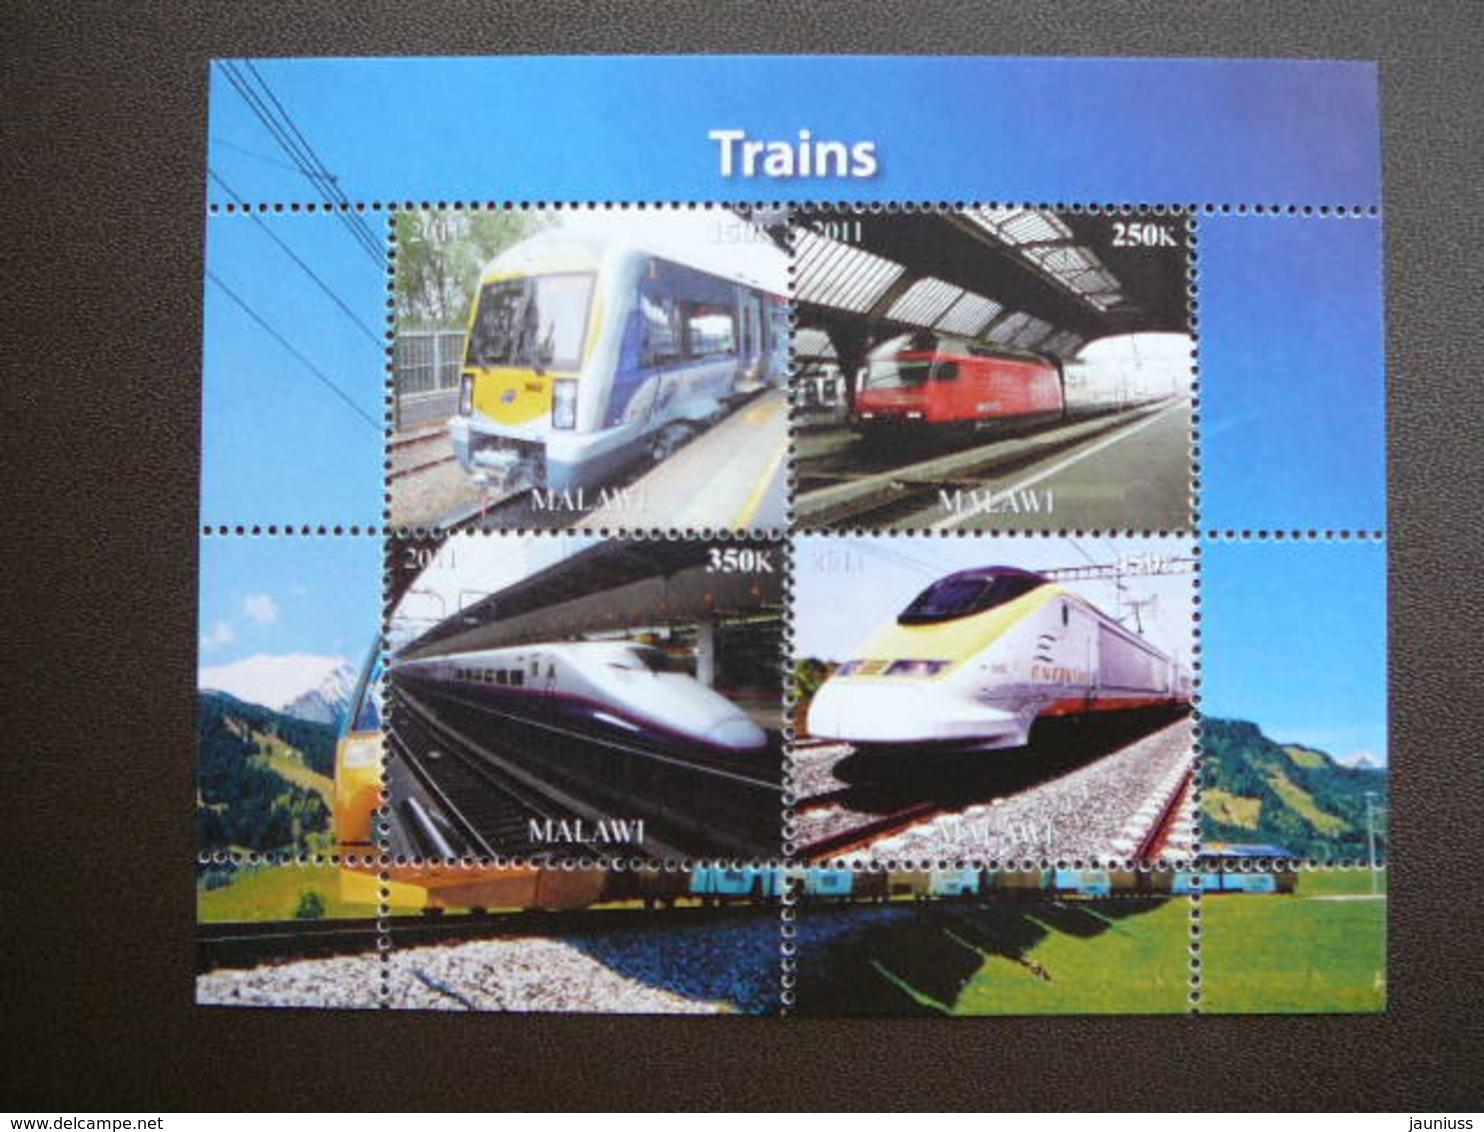 Trains. Züge. Vapeurs # 2011 MNH S/s # (1859) # Locomotives Transport - Trains